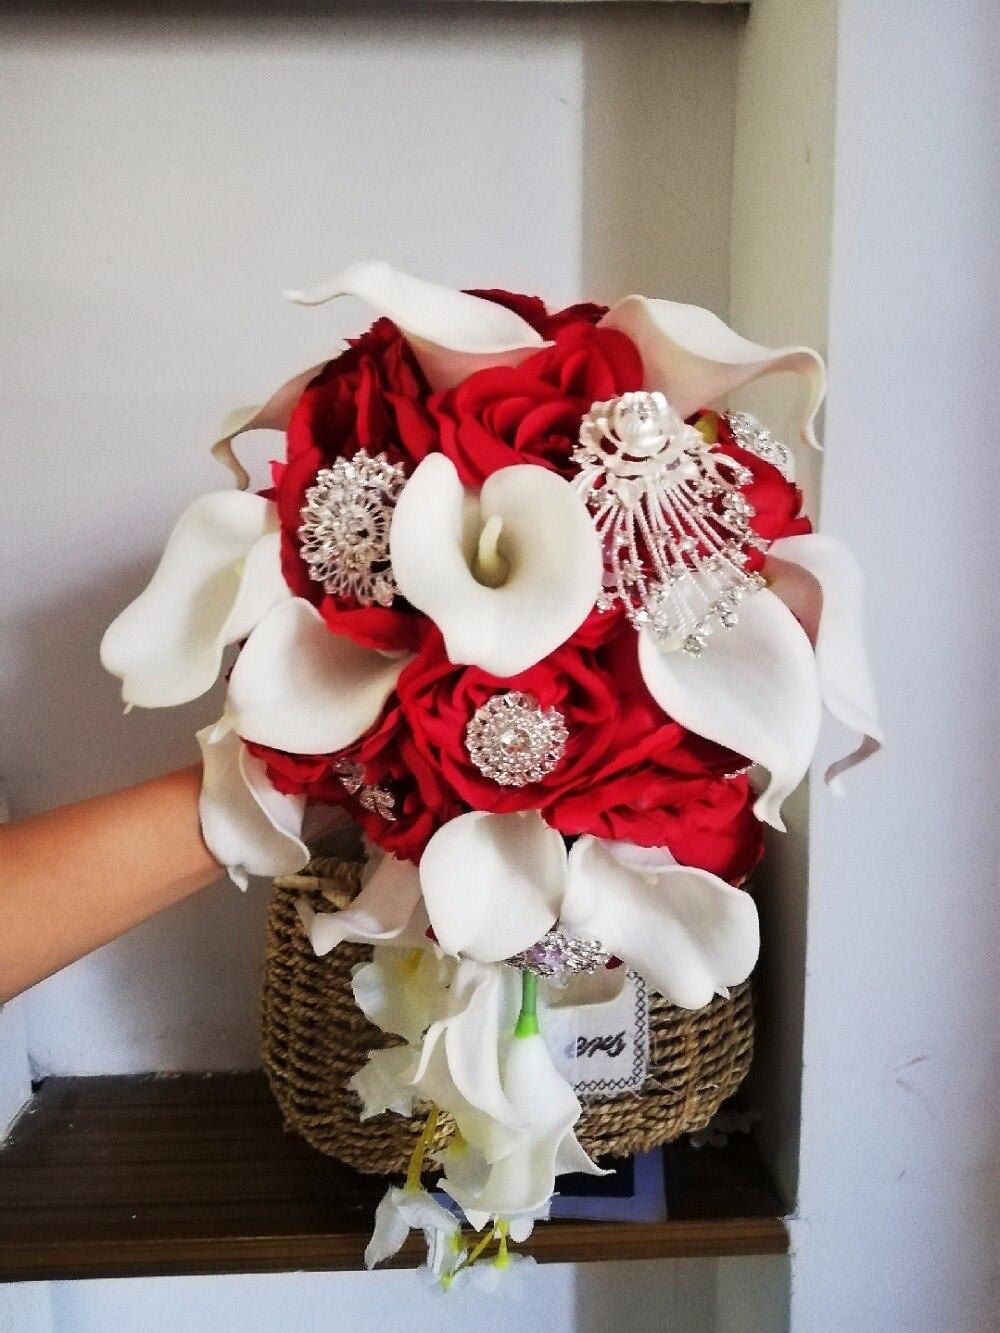 2018 waterfall red wedding flowers white calla lilies bridal 275032274 1091941958 1278518280 1707159469 1905289232 3 img20170903141132mh1511614435603 img20171027151540mh1511614330613 izmirmasajfo